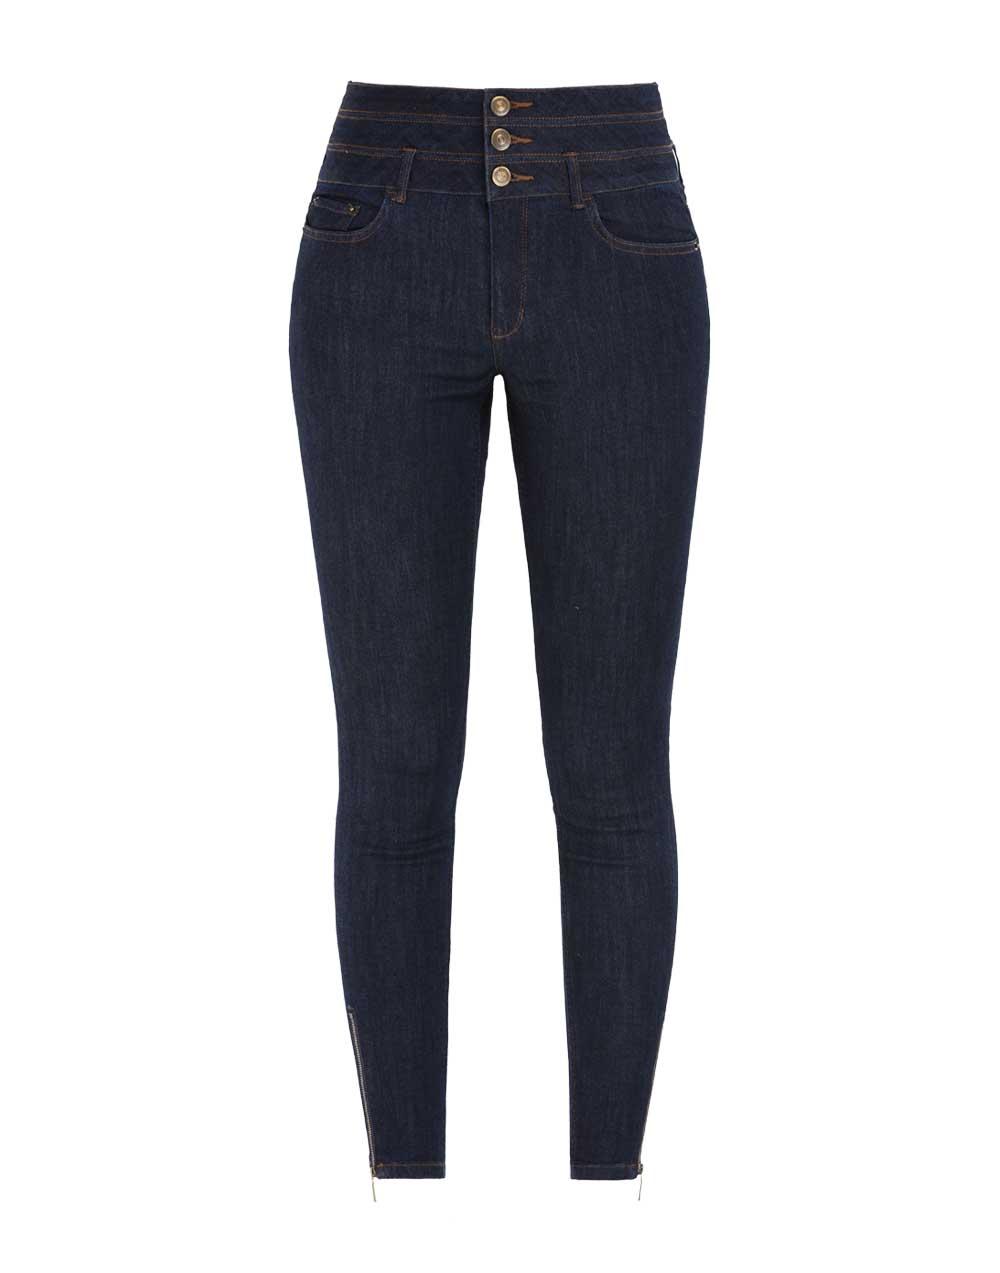 Three Button High Waist Jean